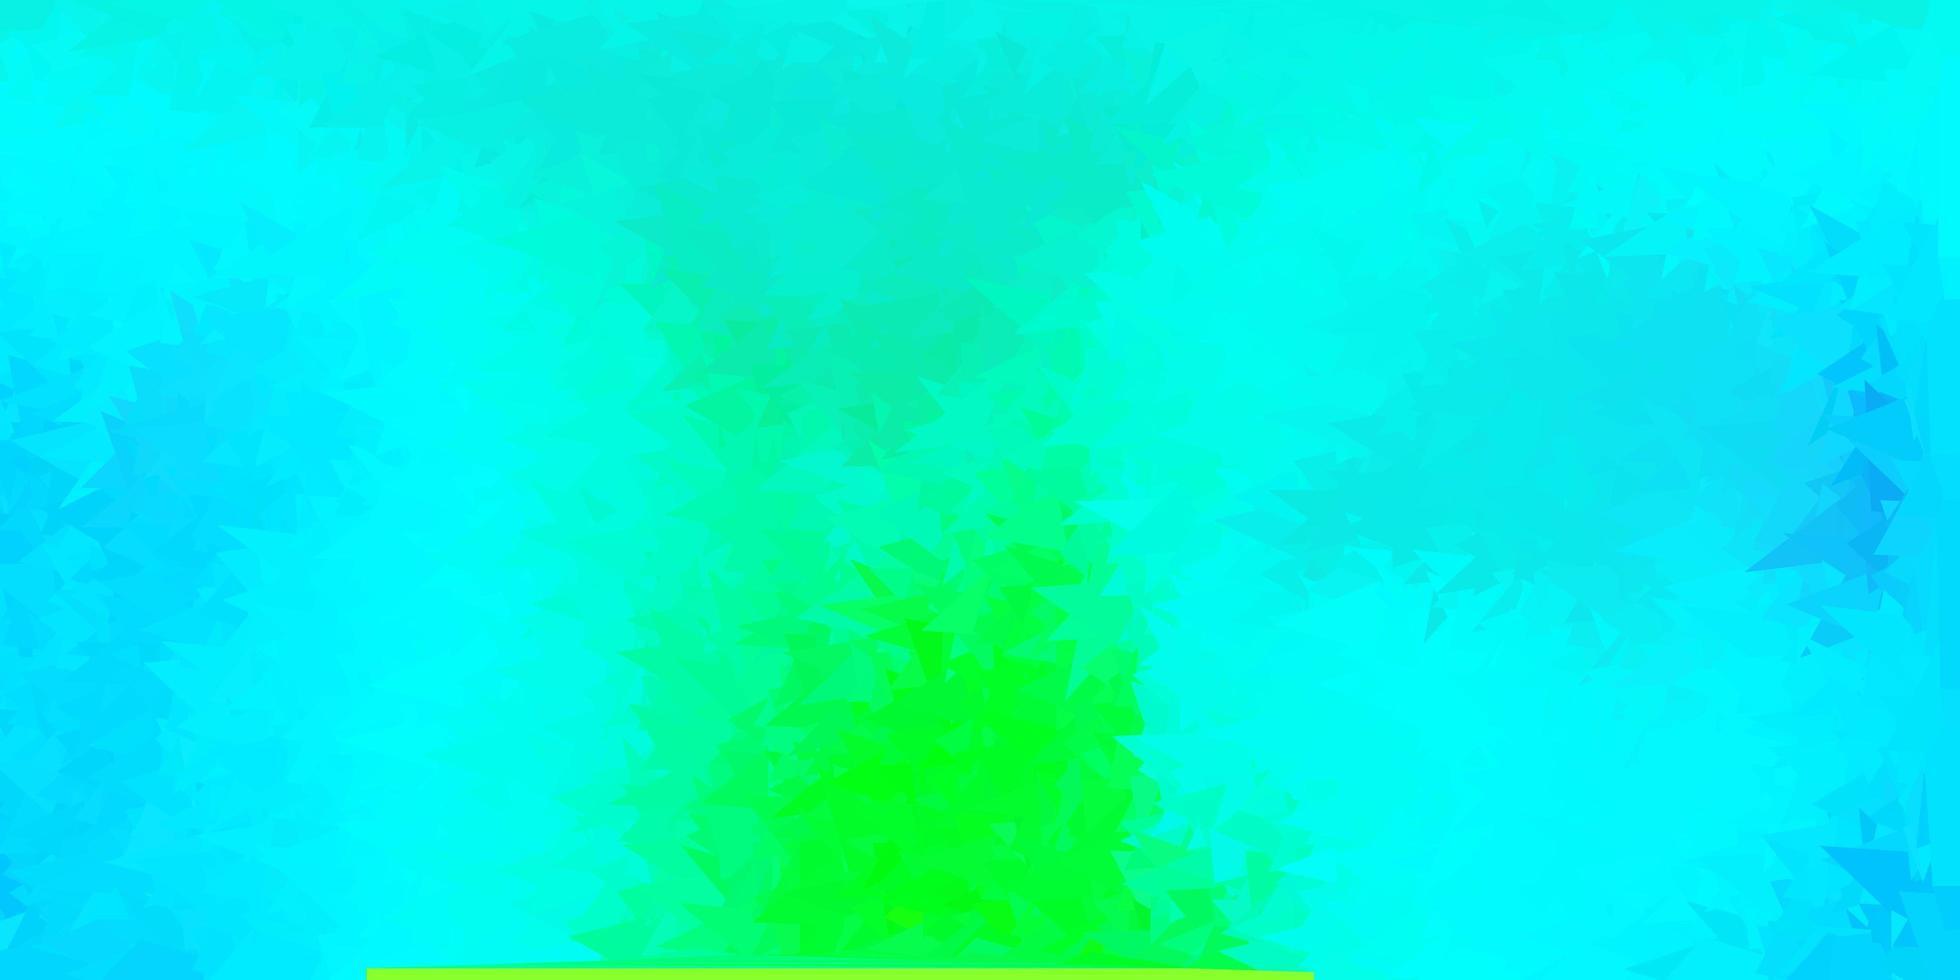 Fondo de triángulo abstracto de vector azul oscuro, verde.